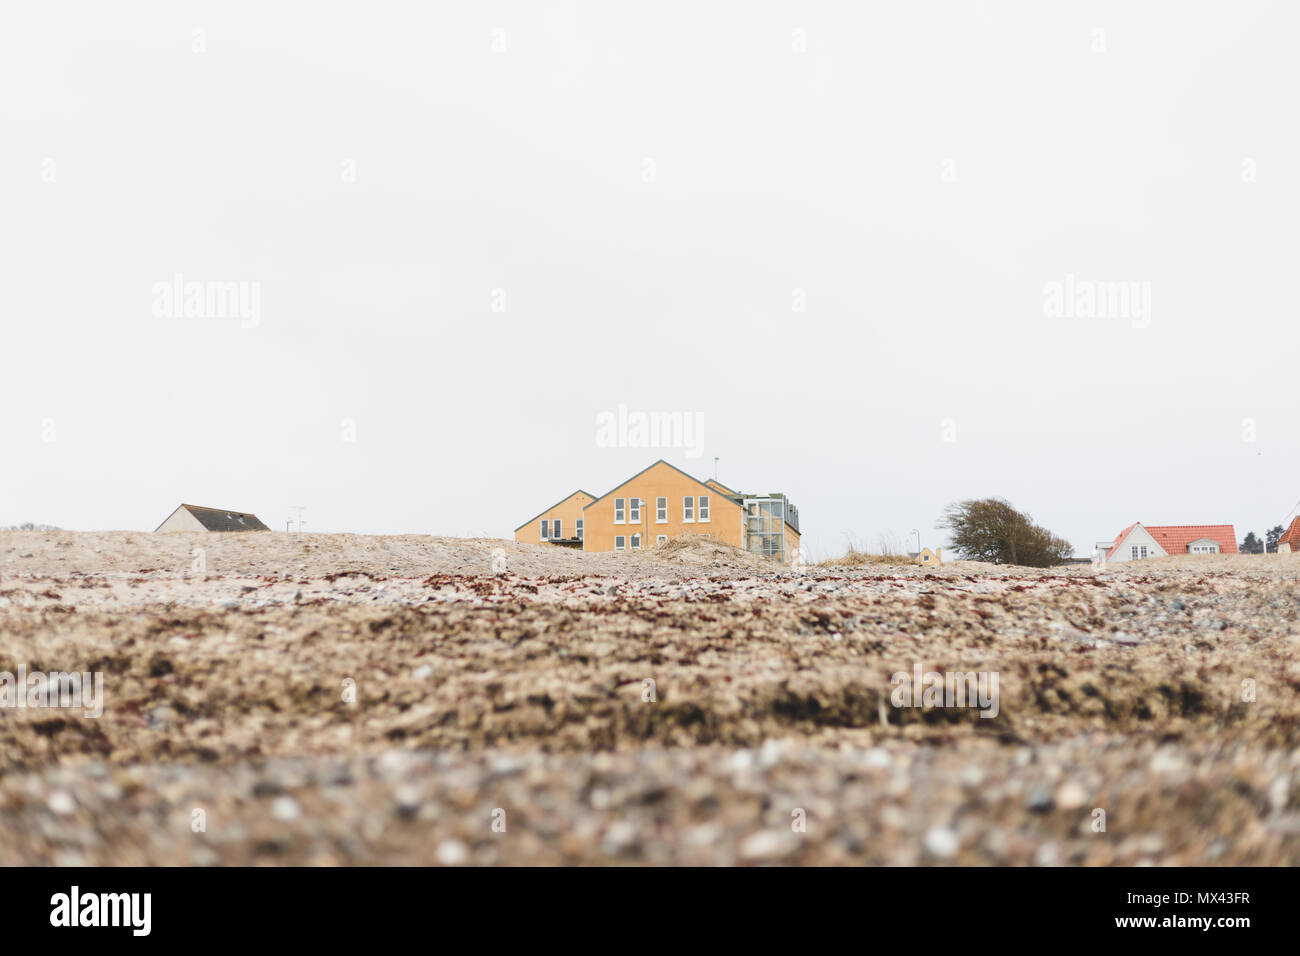 Colorful houses in the seashore, danish beach. - Stock Image